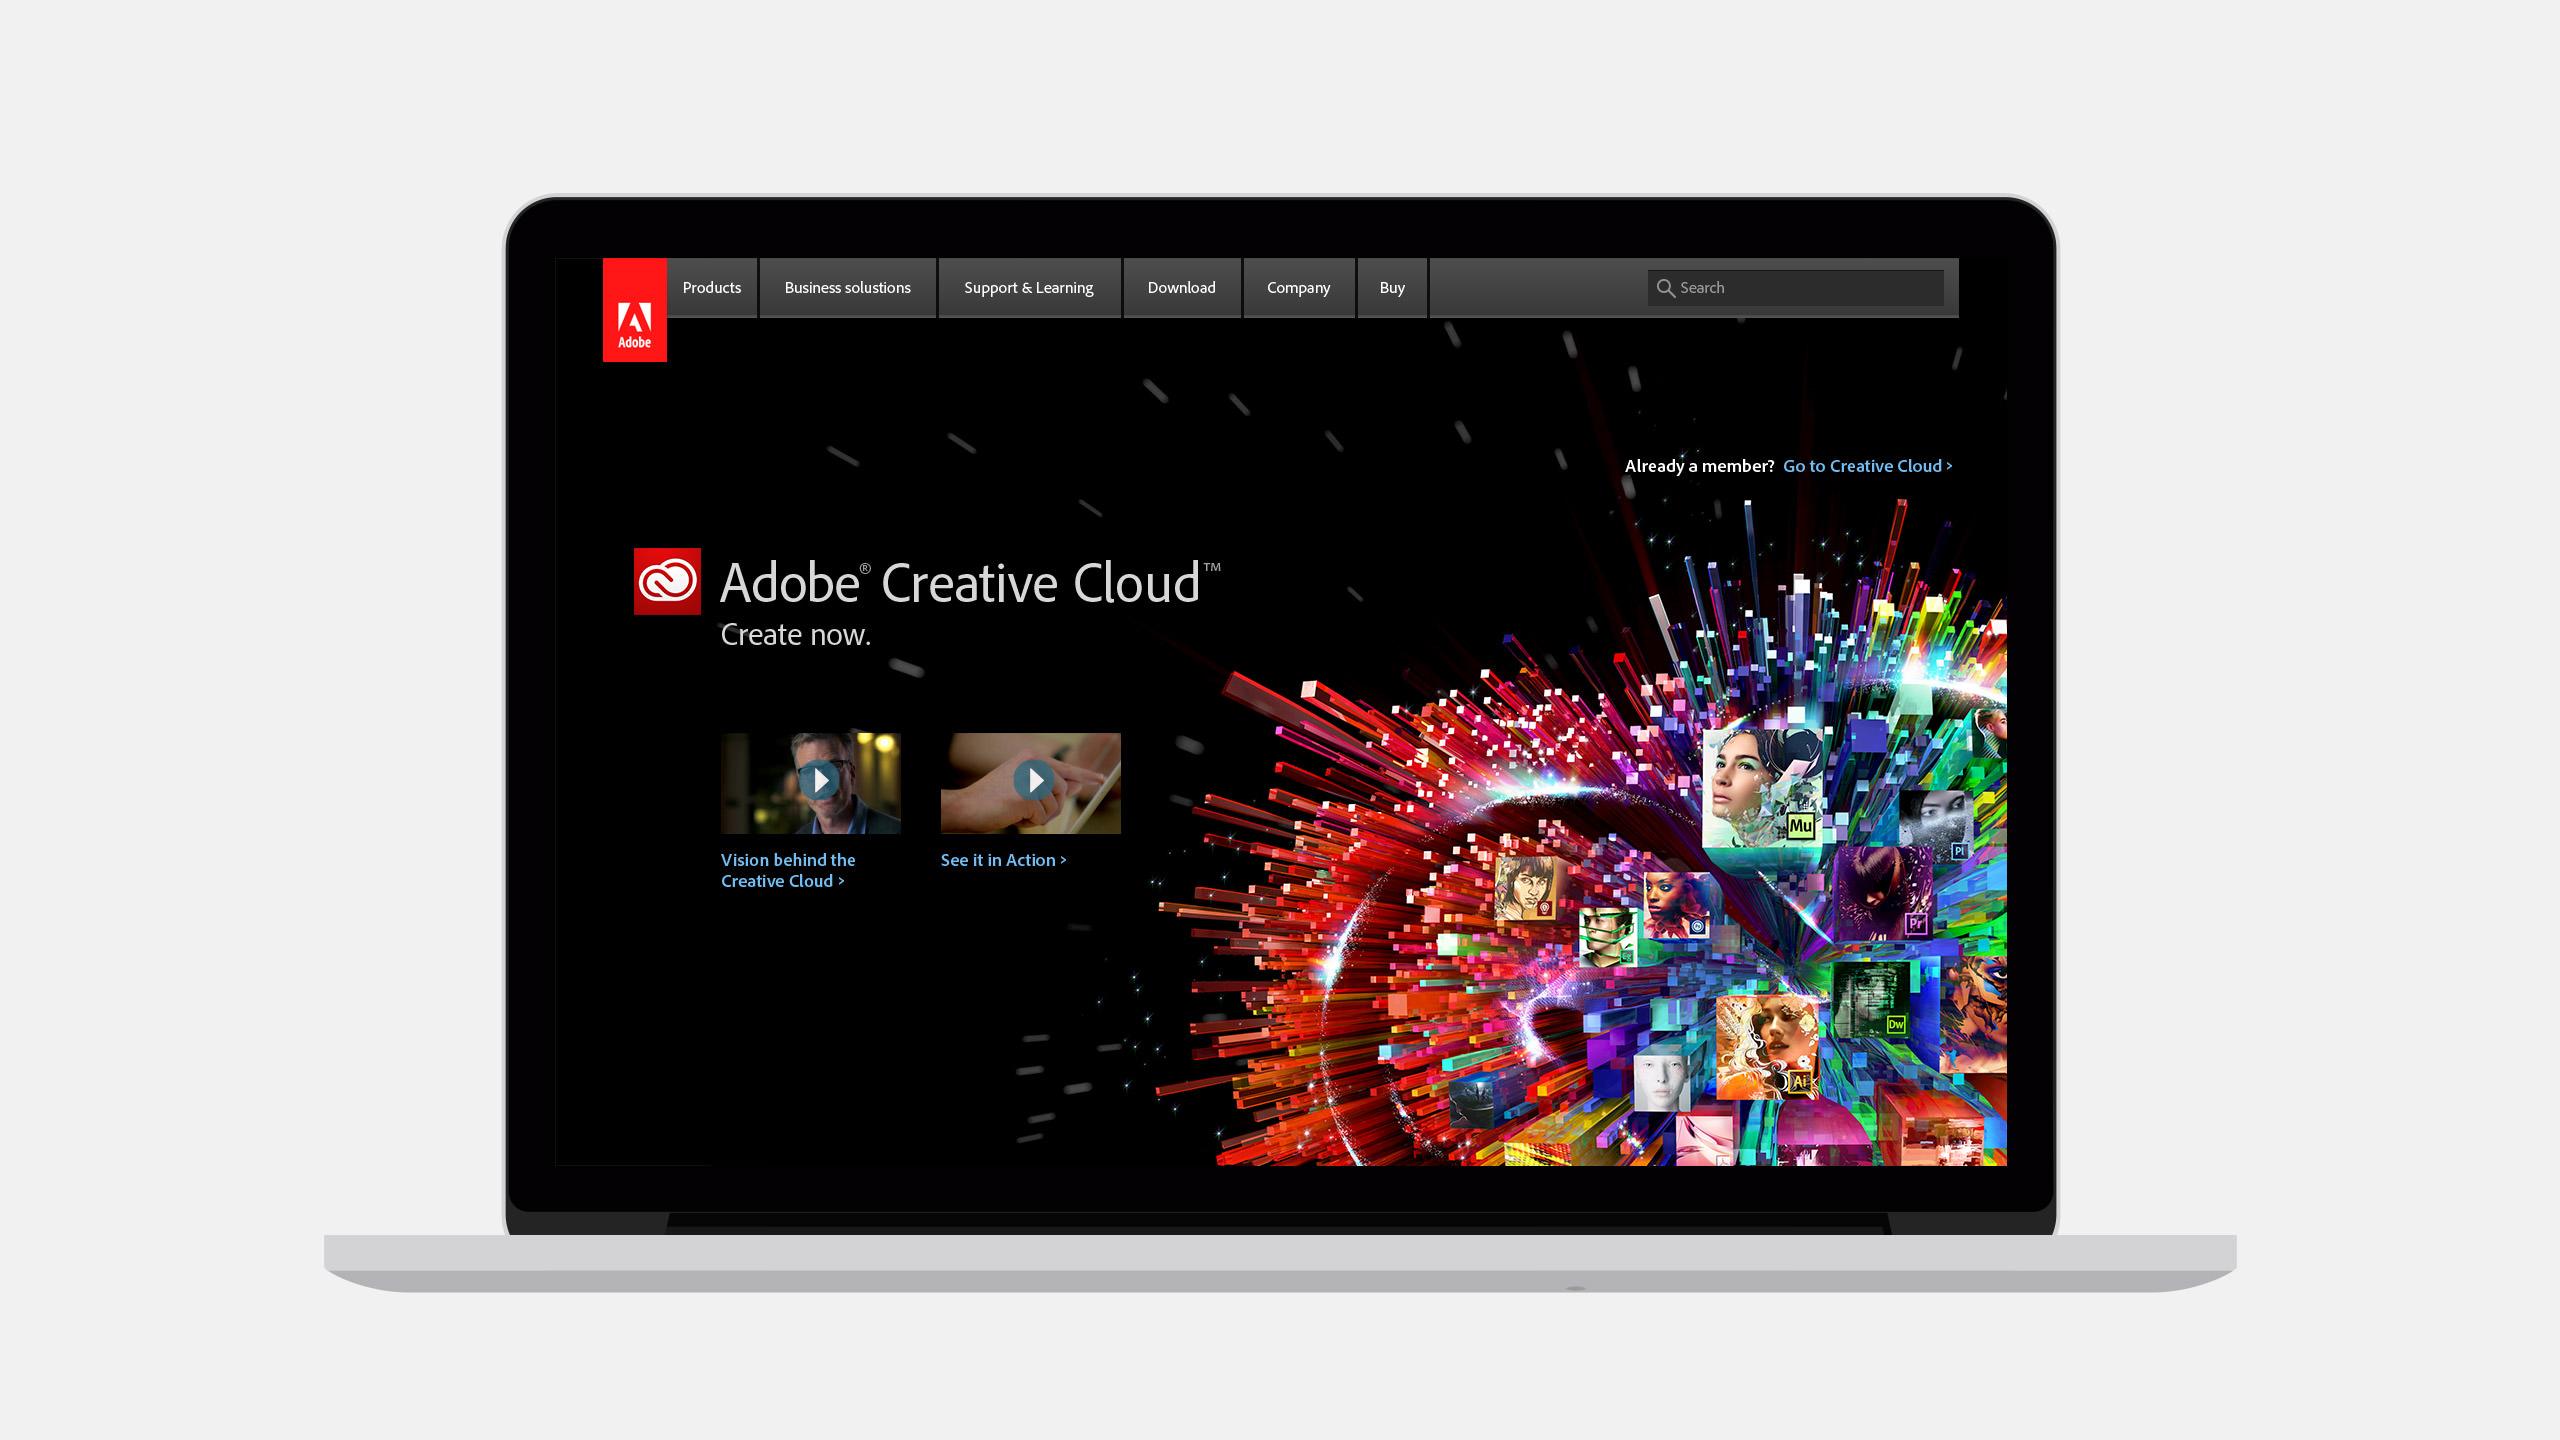 Adobe Creative Cloud Web Product on a Laptop